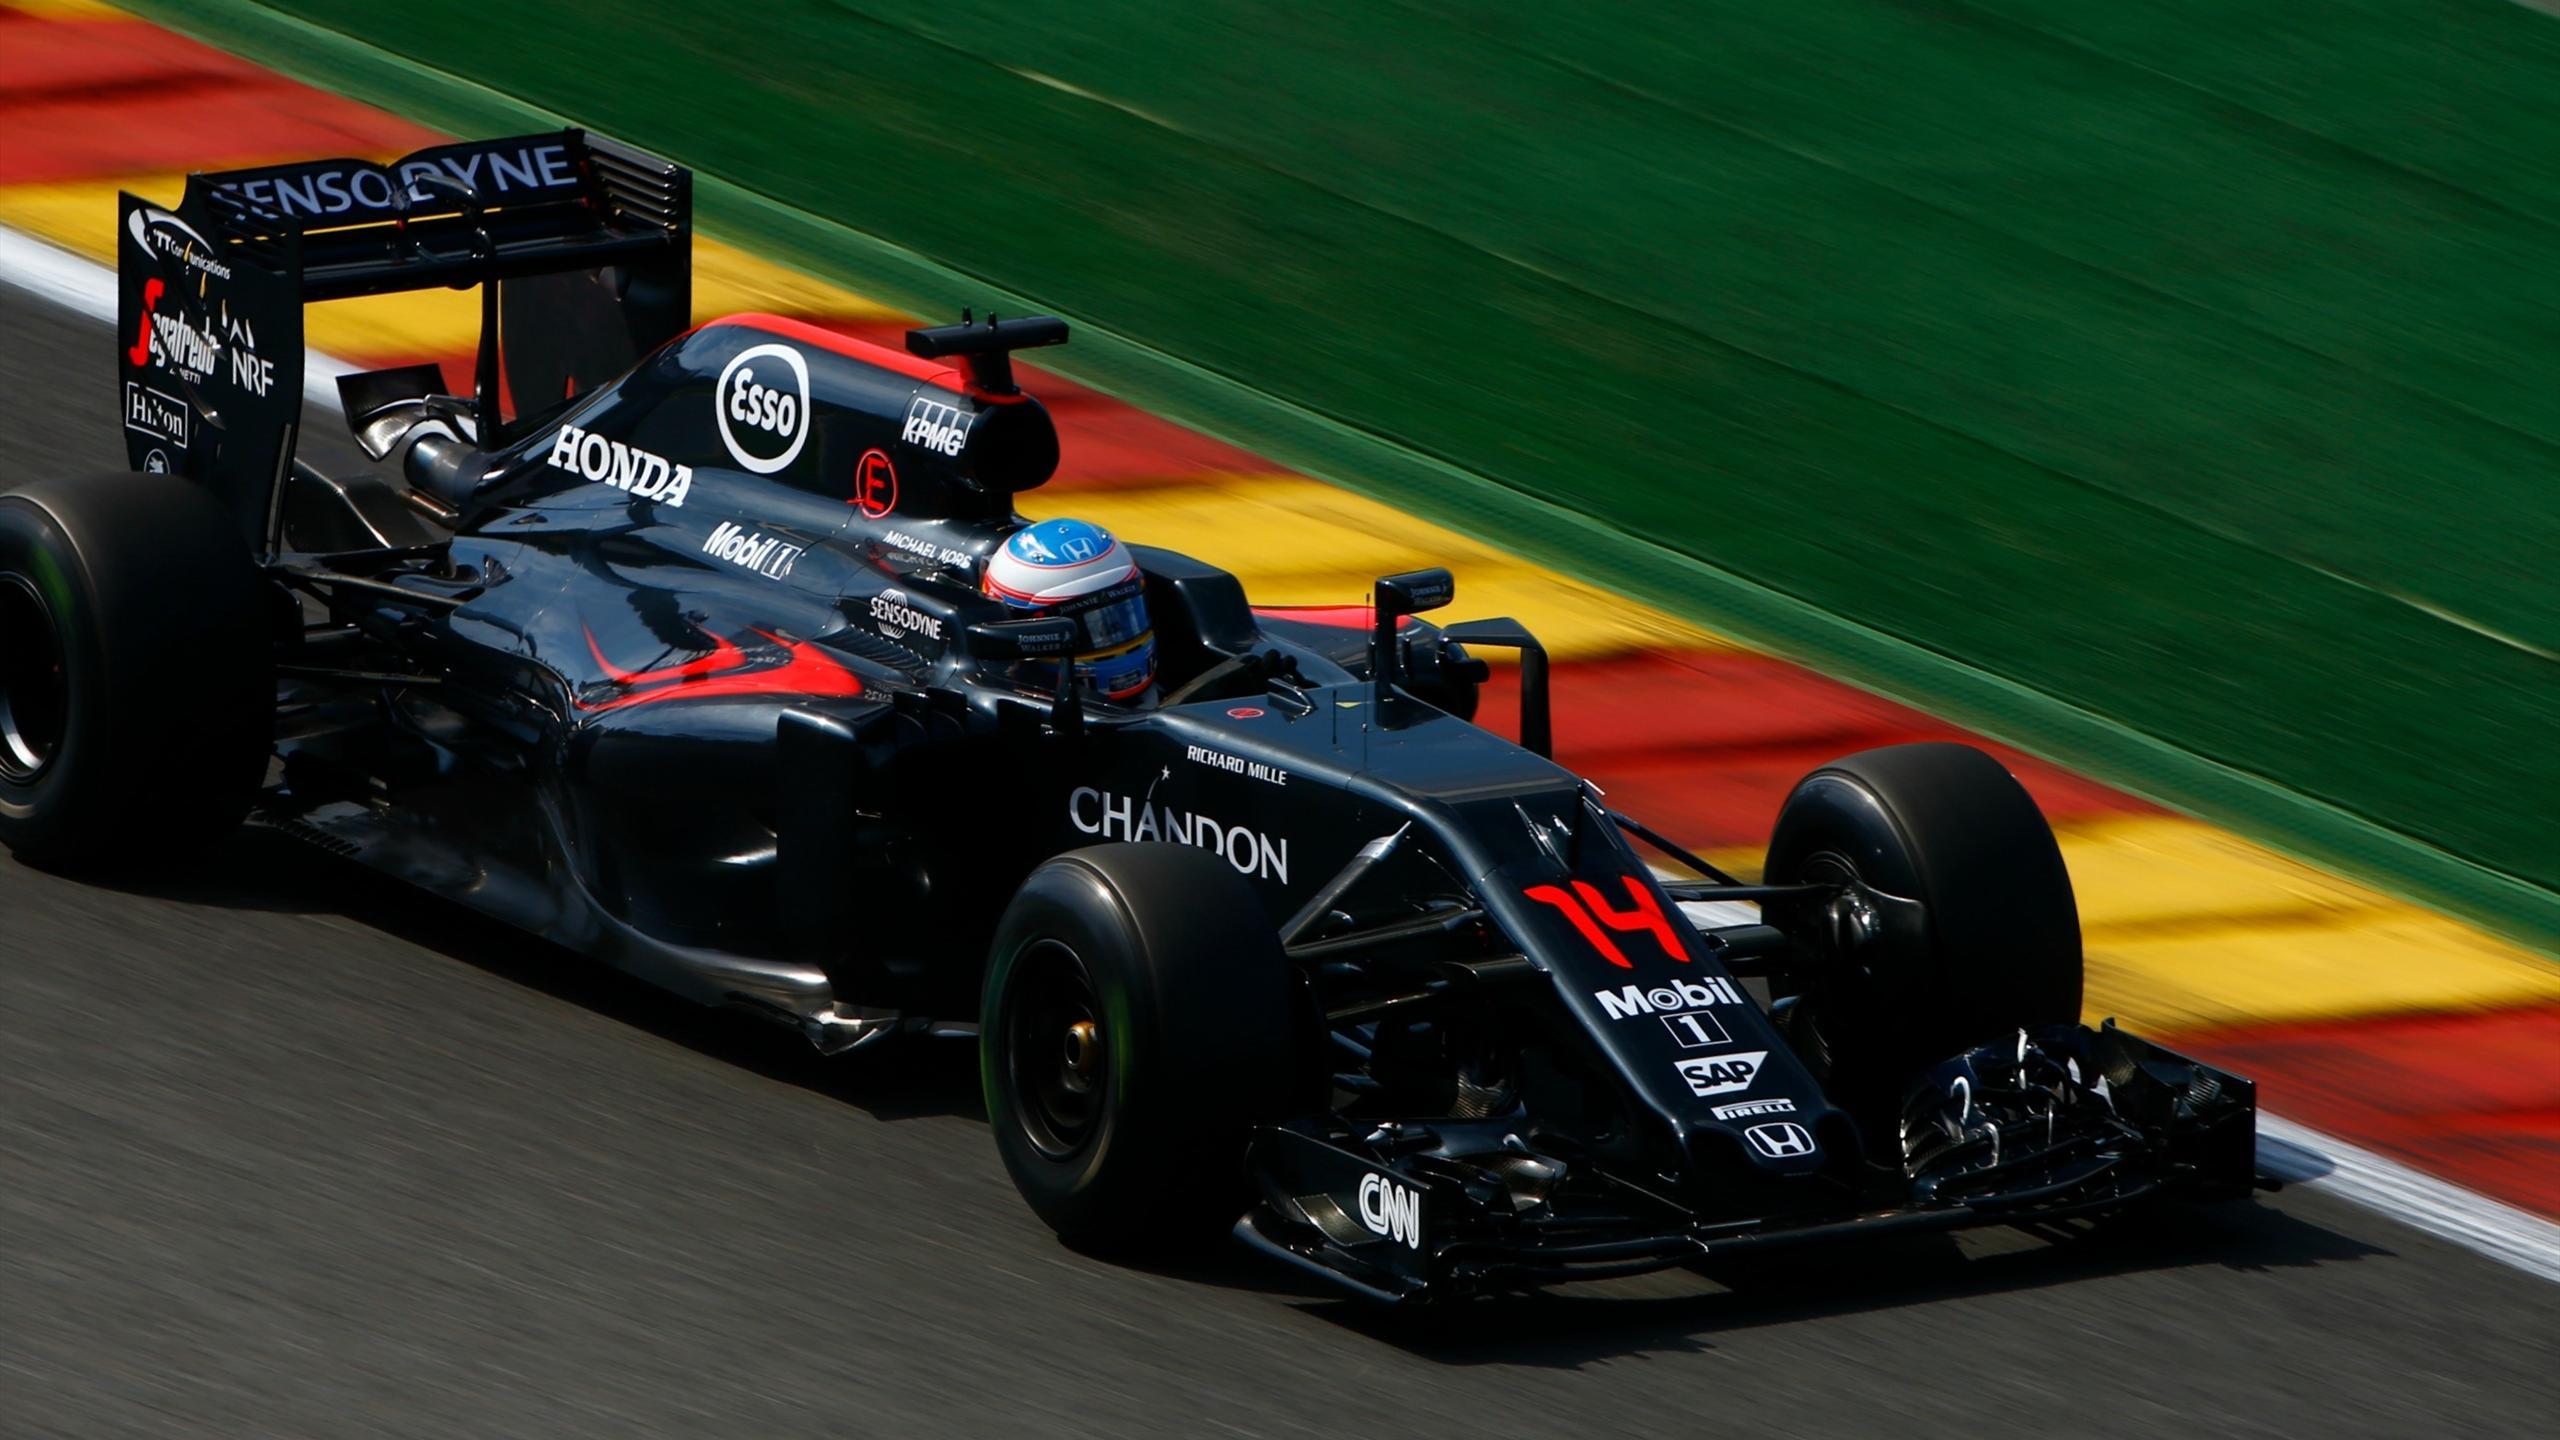 Fernando Alonso (McLaren) - GP of Belgium 2016